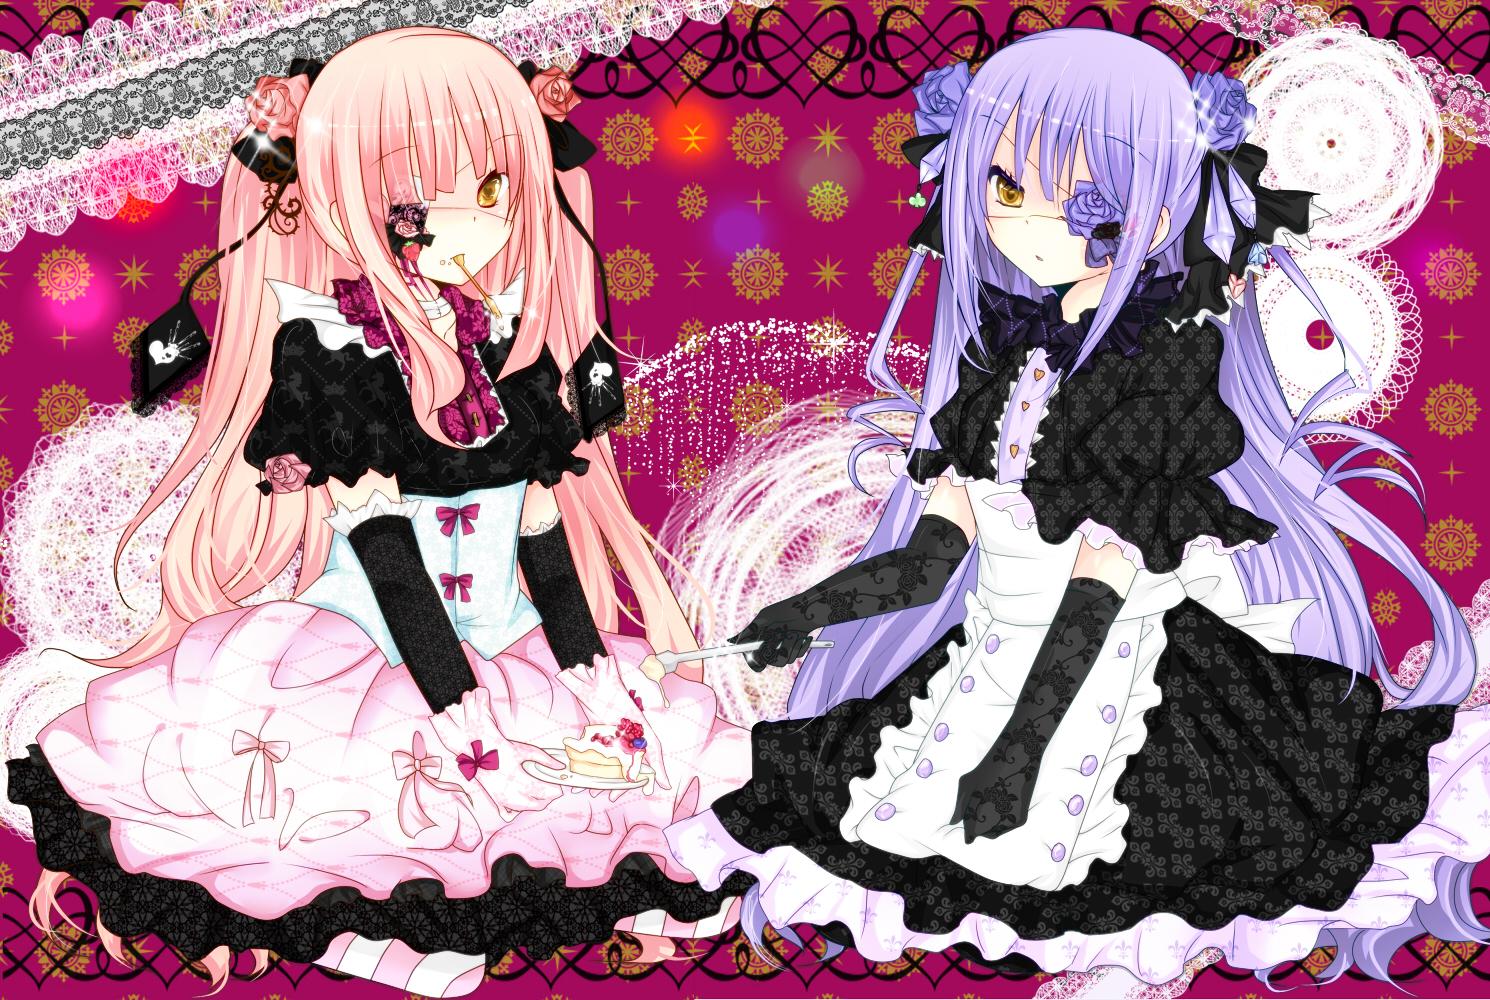 2girls aliasing barasuishou dress elbow_gloves eyepatch food gloves goth-loli kirakishou lolita_fashion rozen_maiden sakuragi_yuzuki